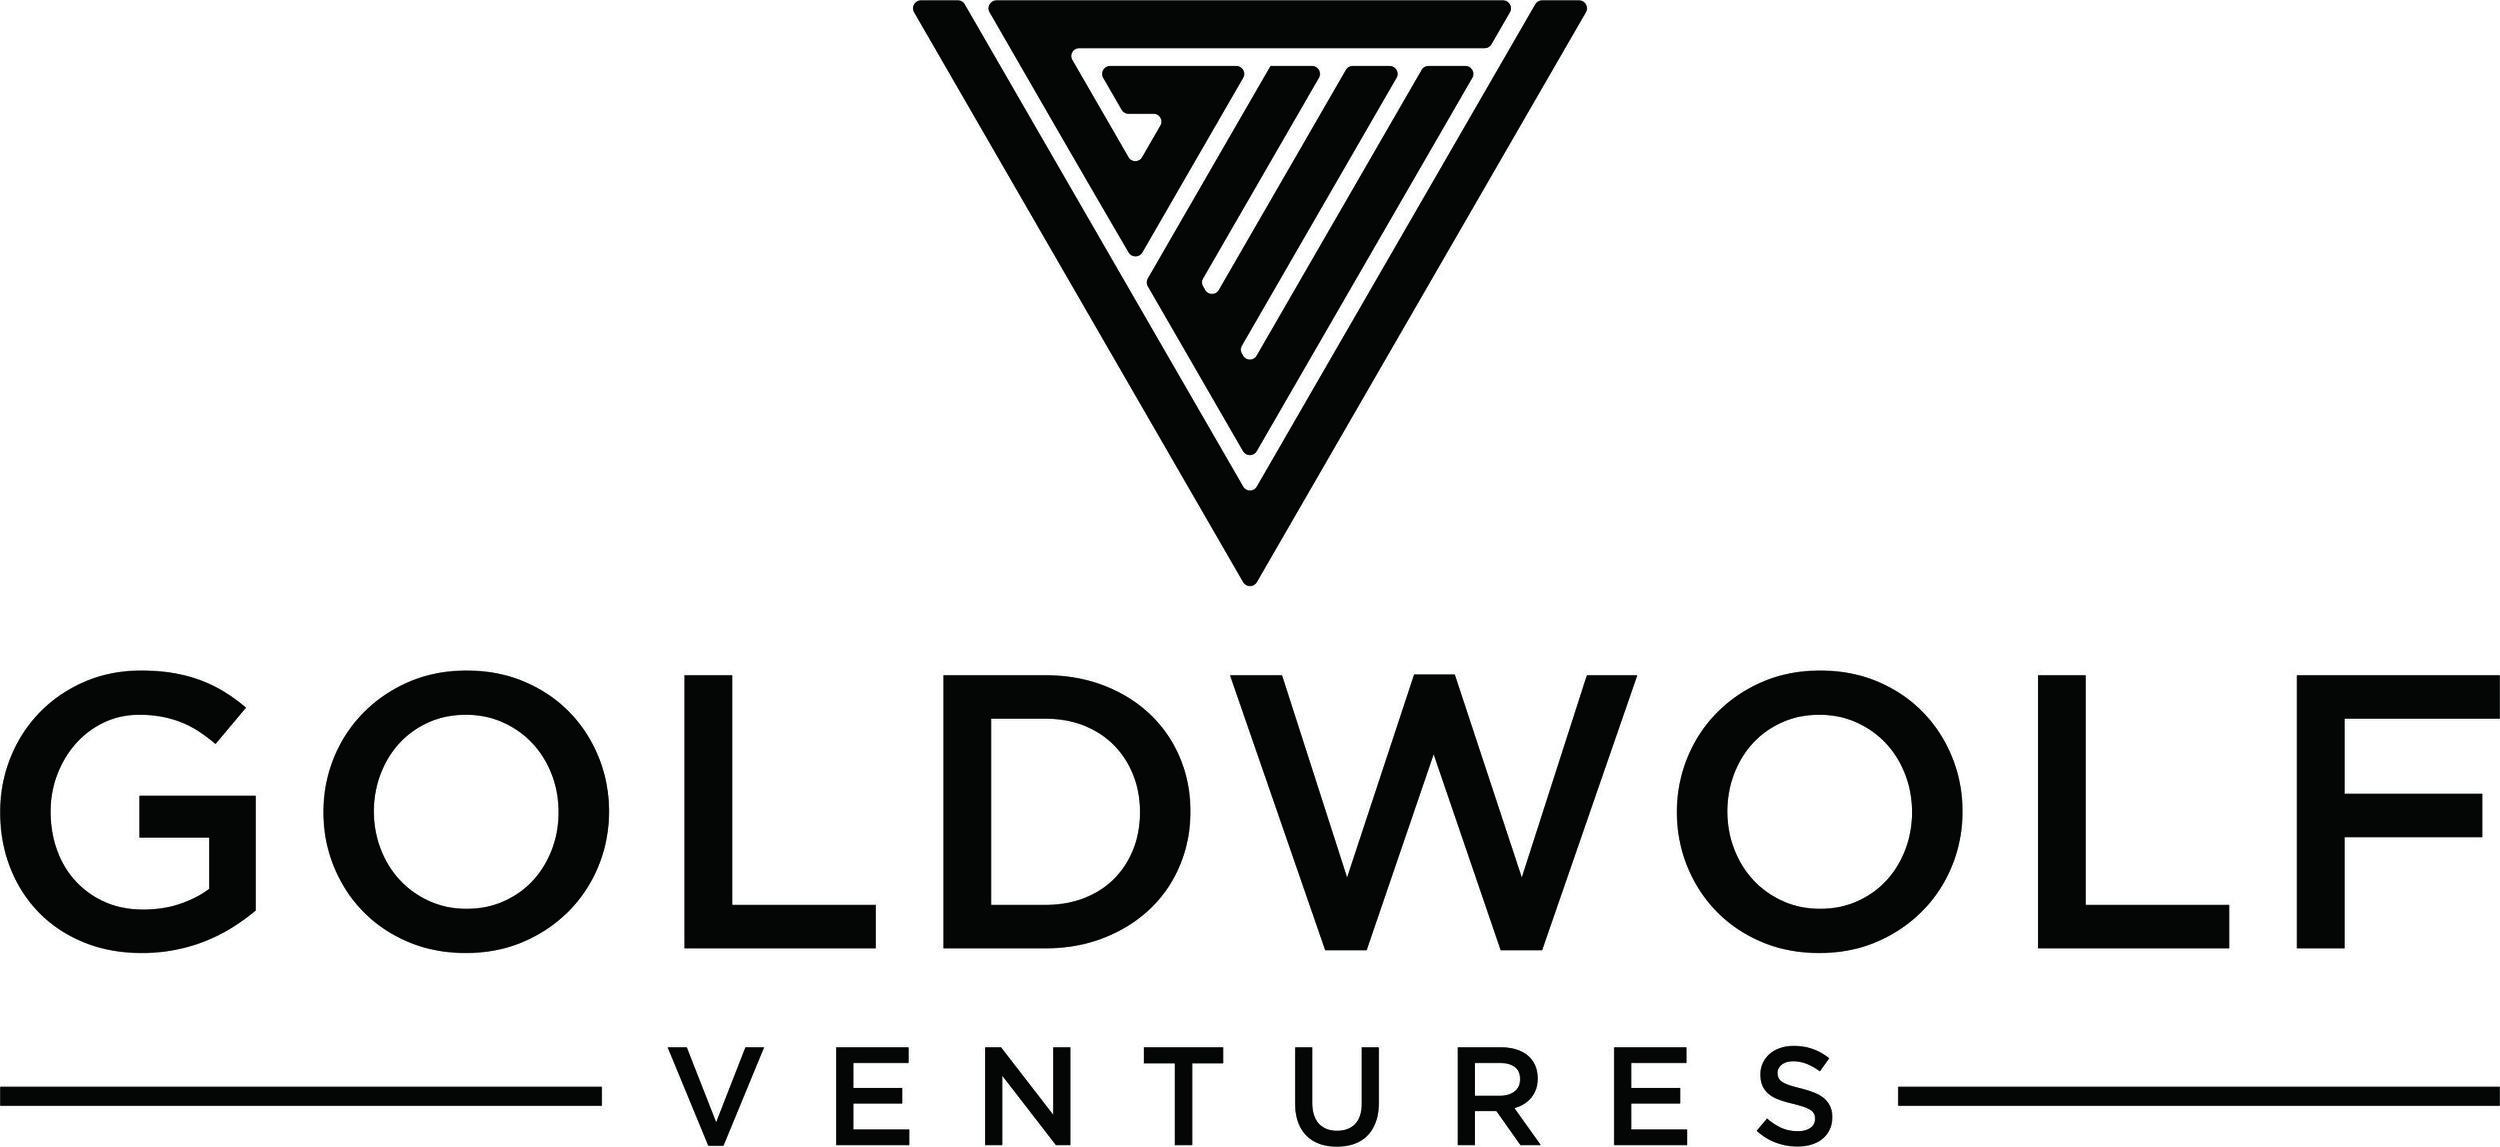 Goldwolf Ventures.jpg